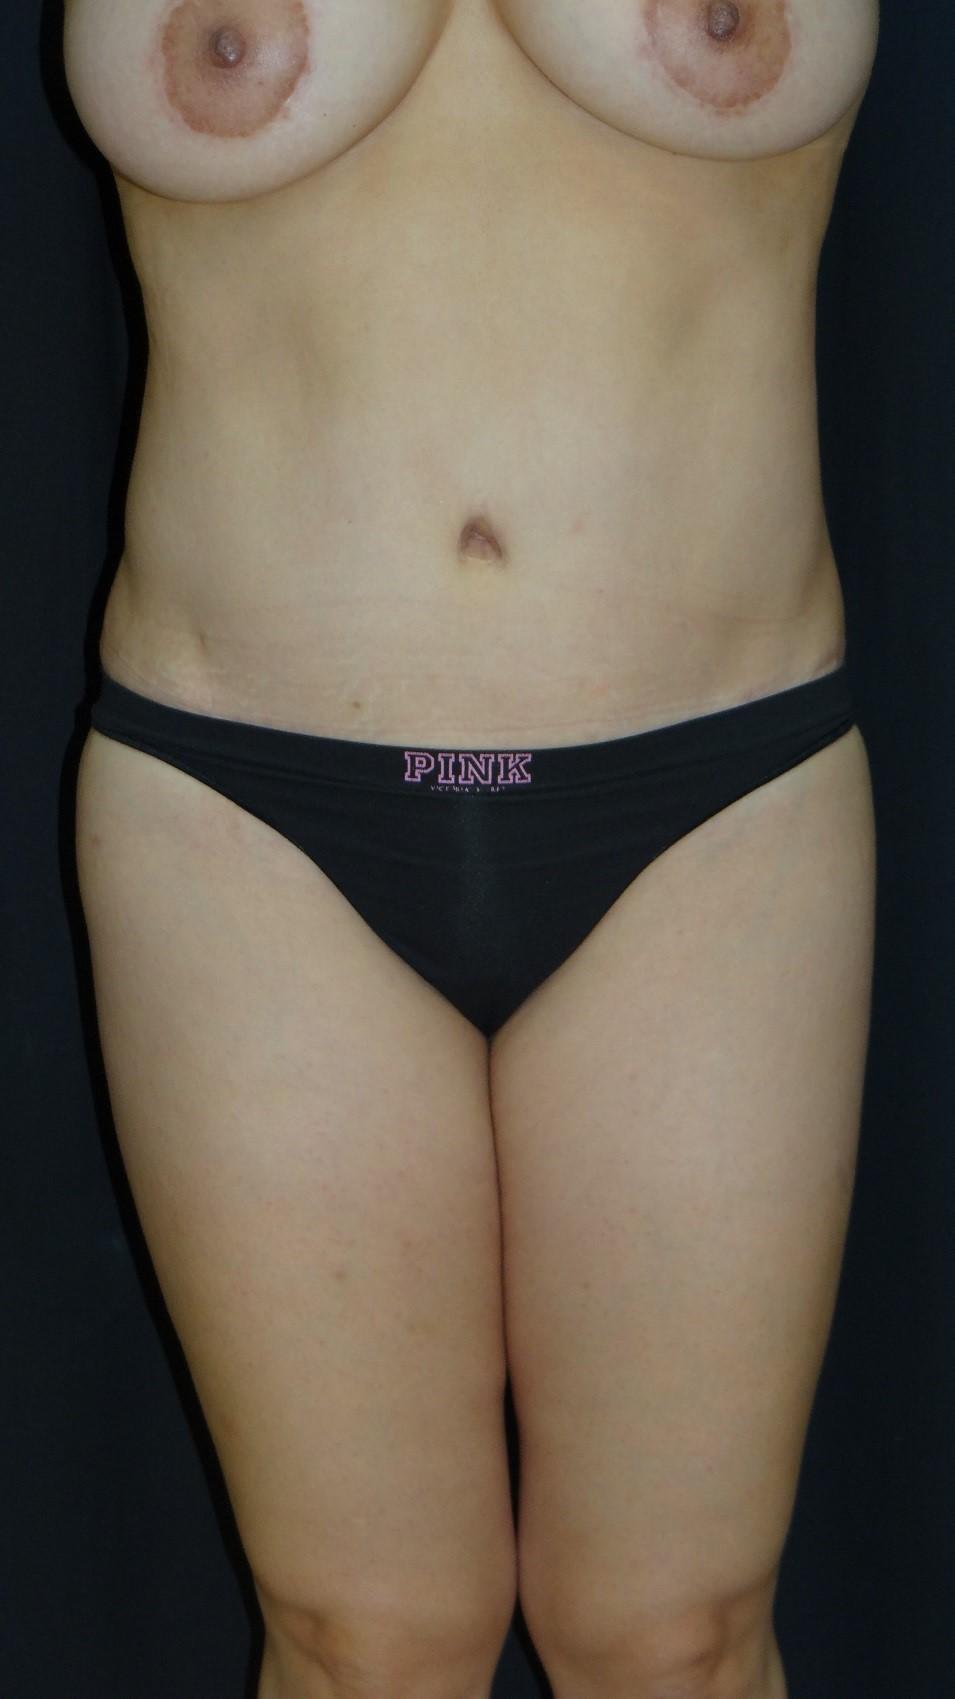 Tummy-Tuck-Abdominoplasty-Liposuction-Virginia-Beach-Plastic-Surgery-002-B